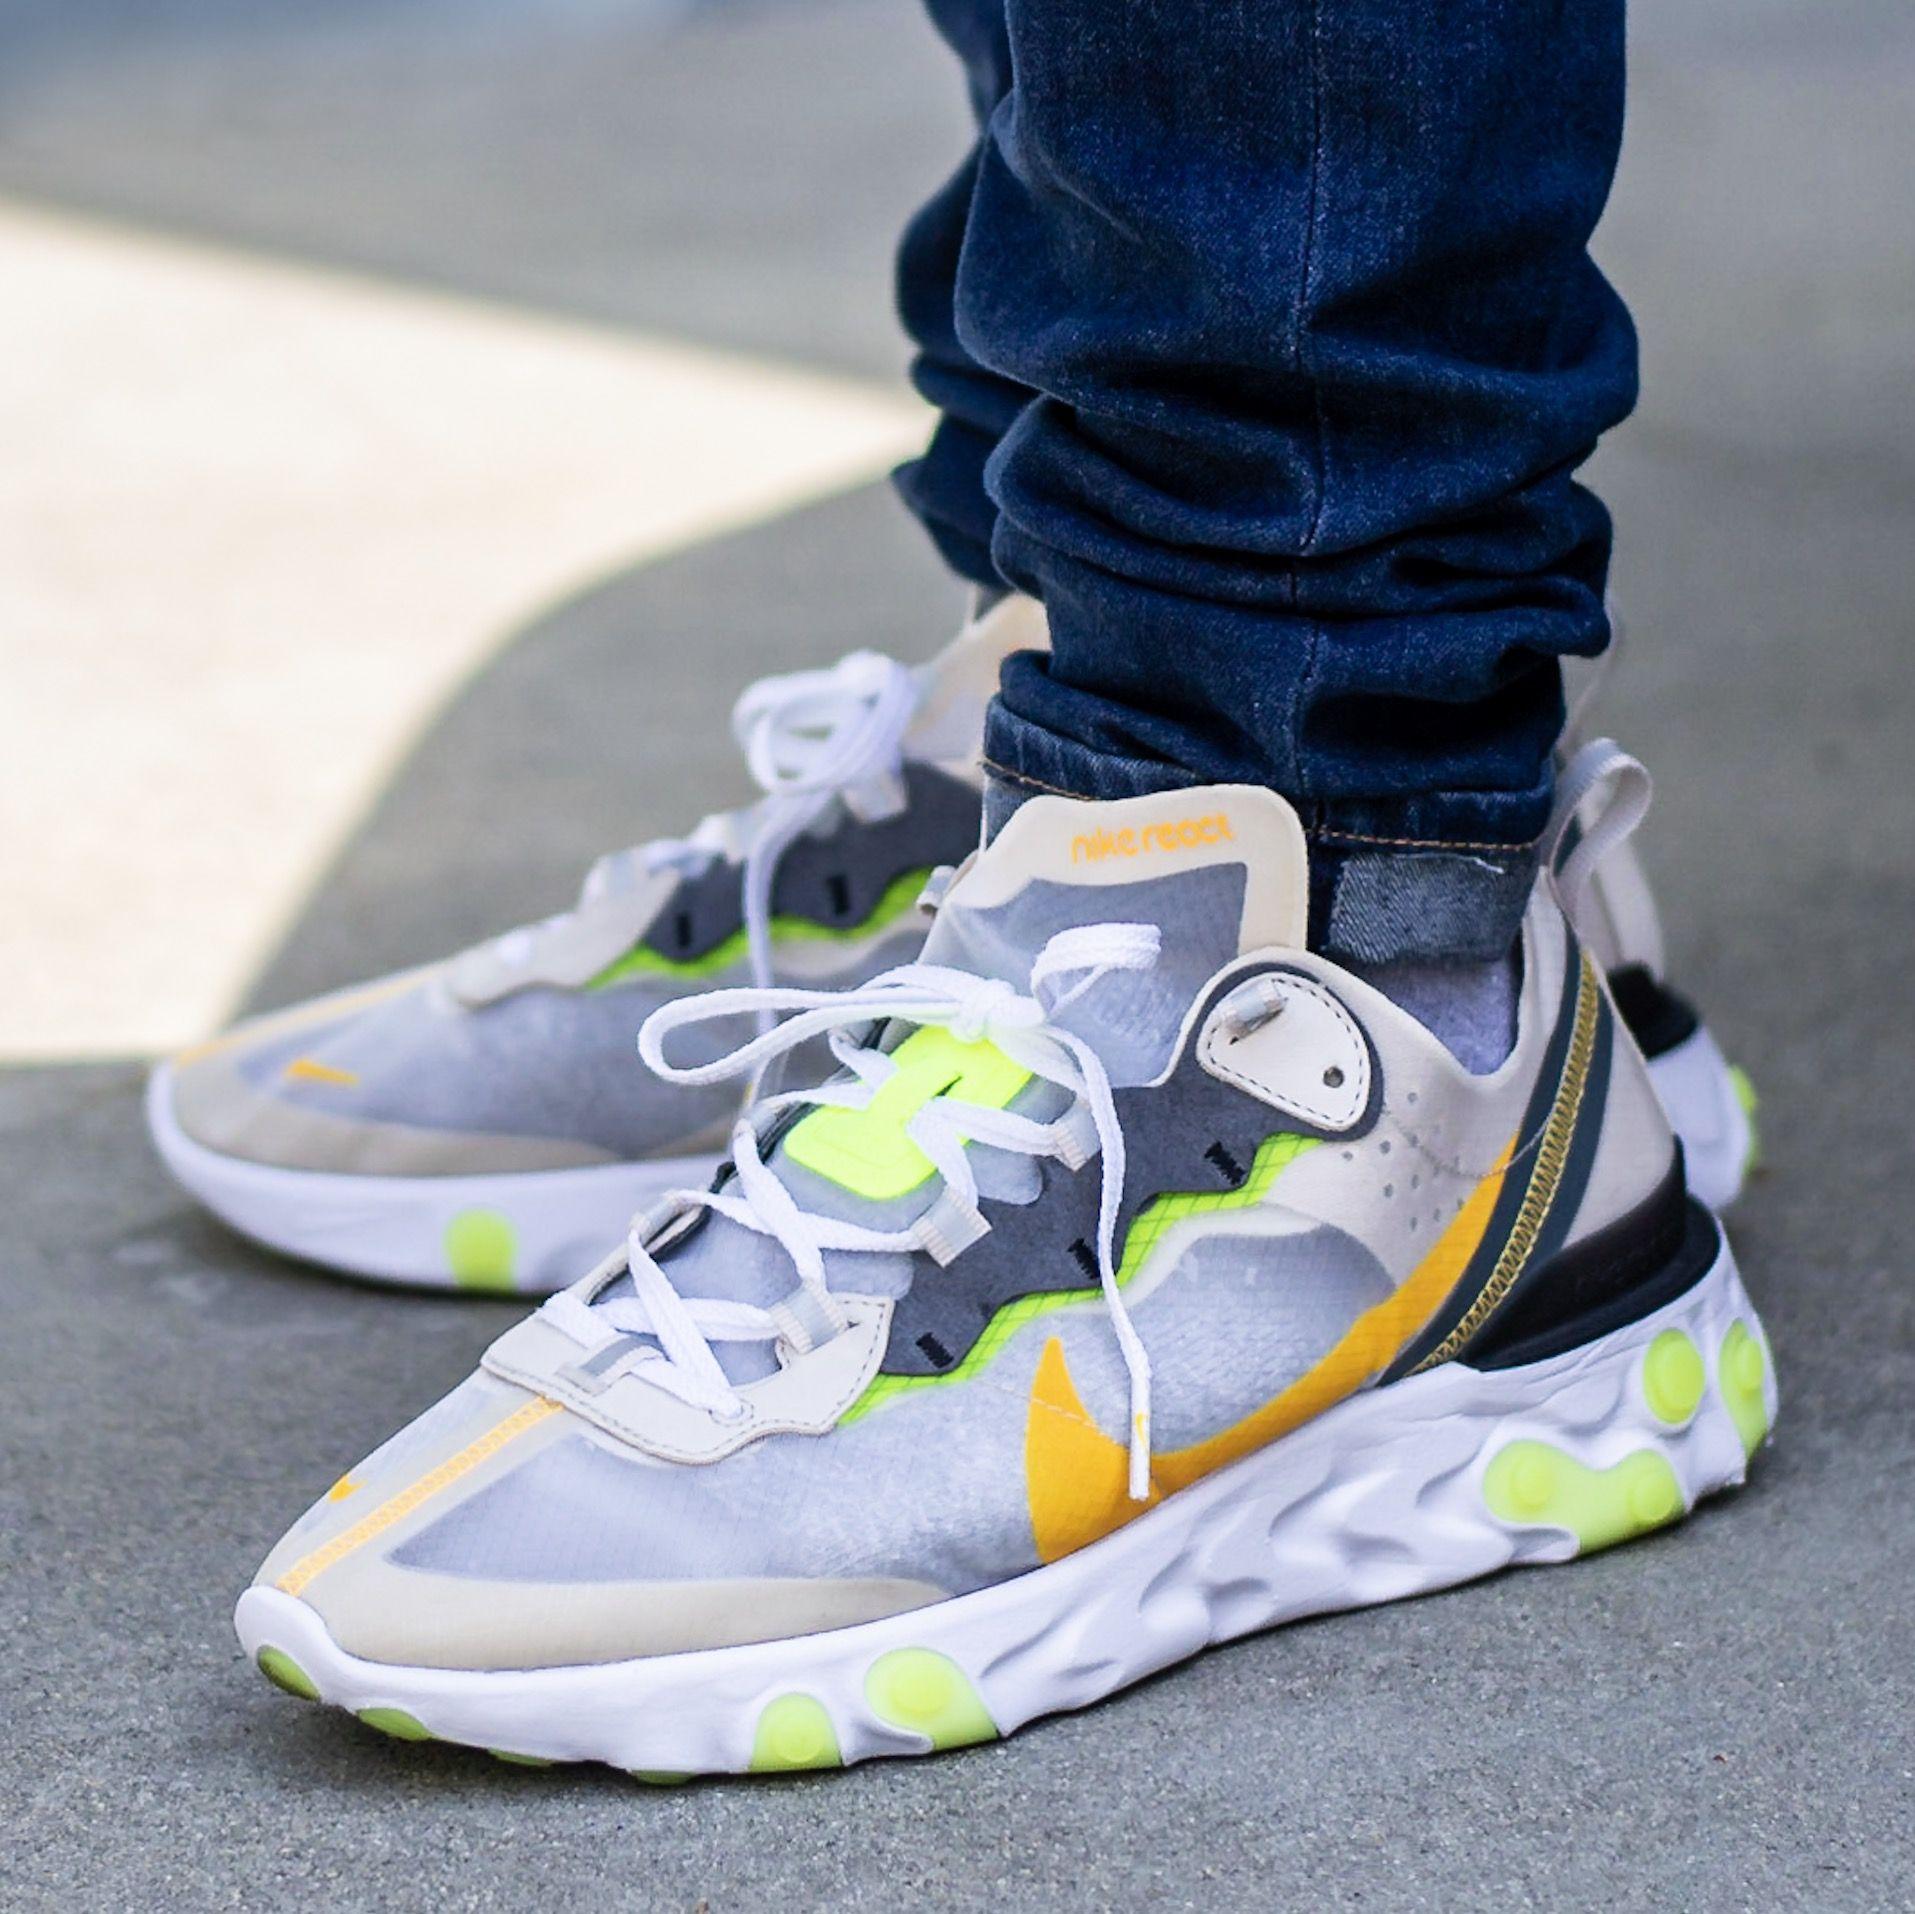 Nike React Element 87 Light Orewood On Feet Sneaker Review